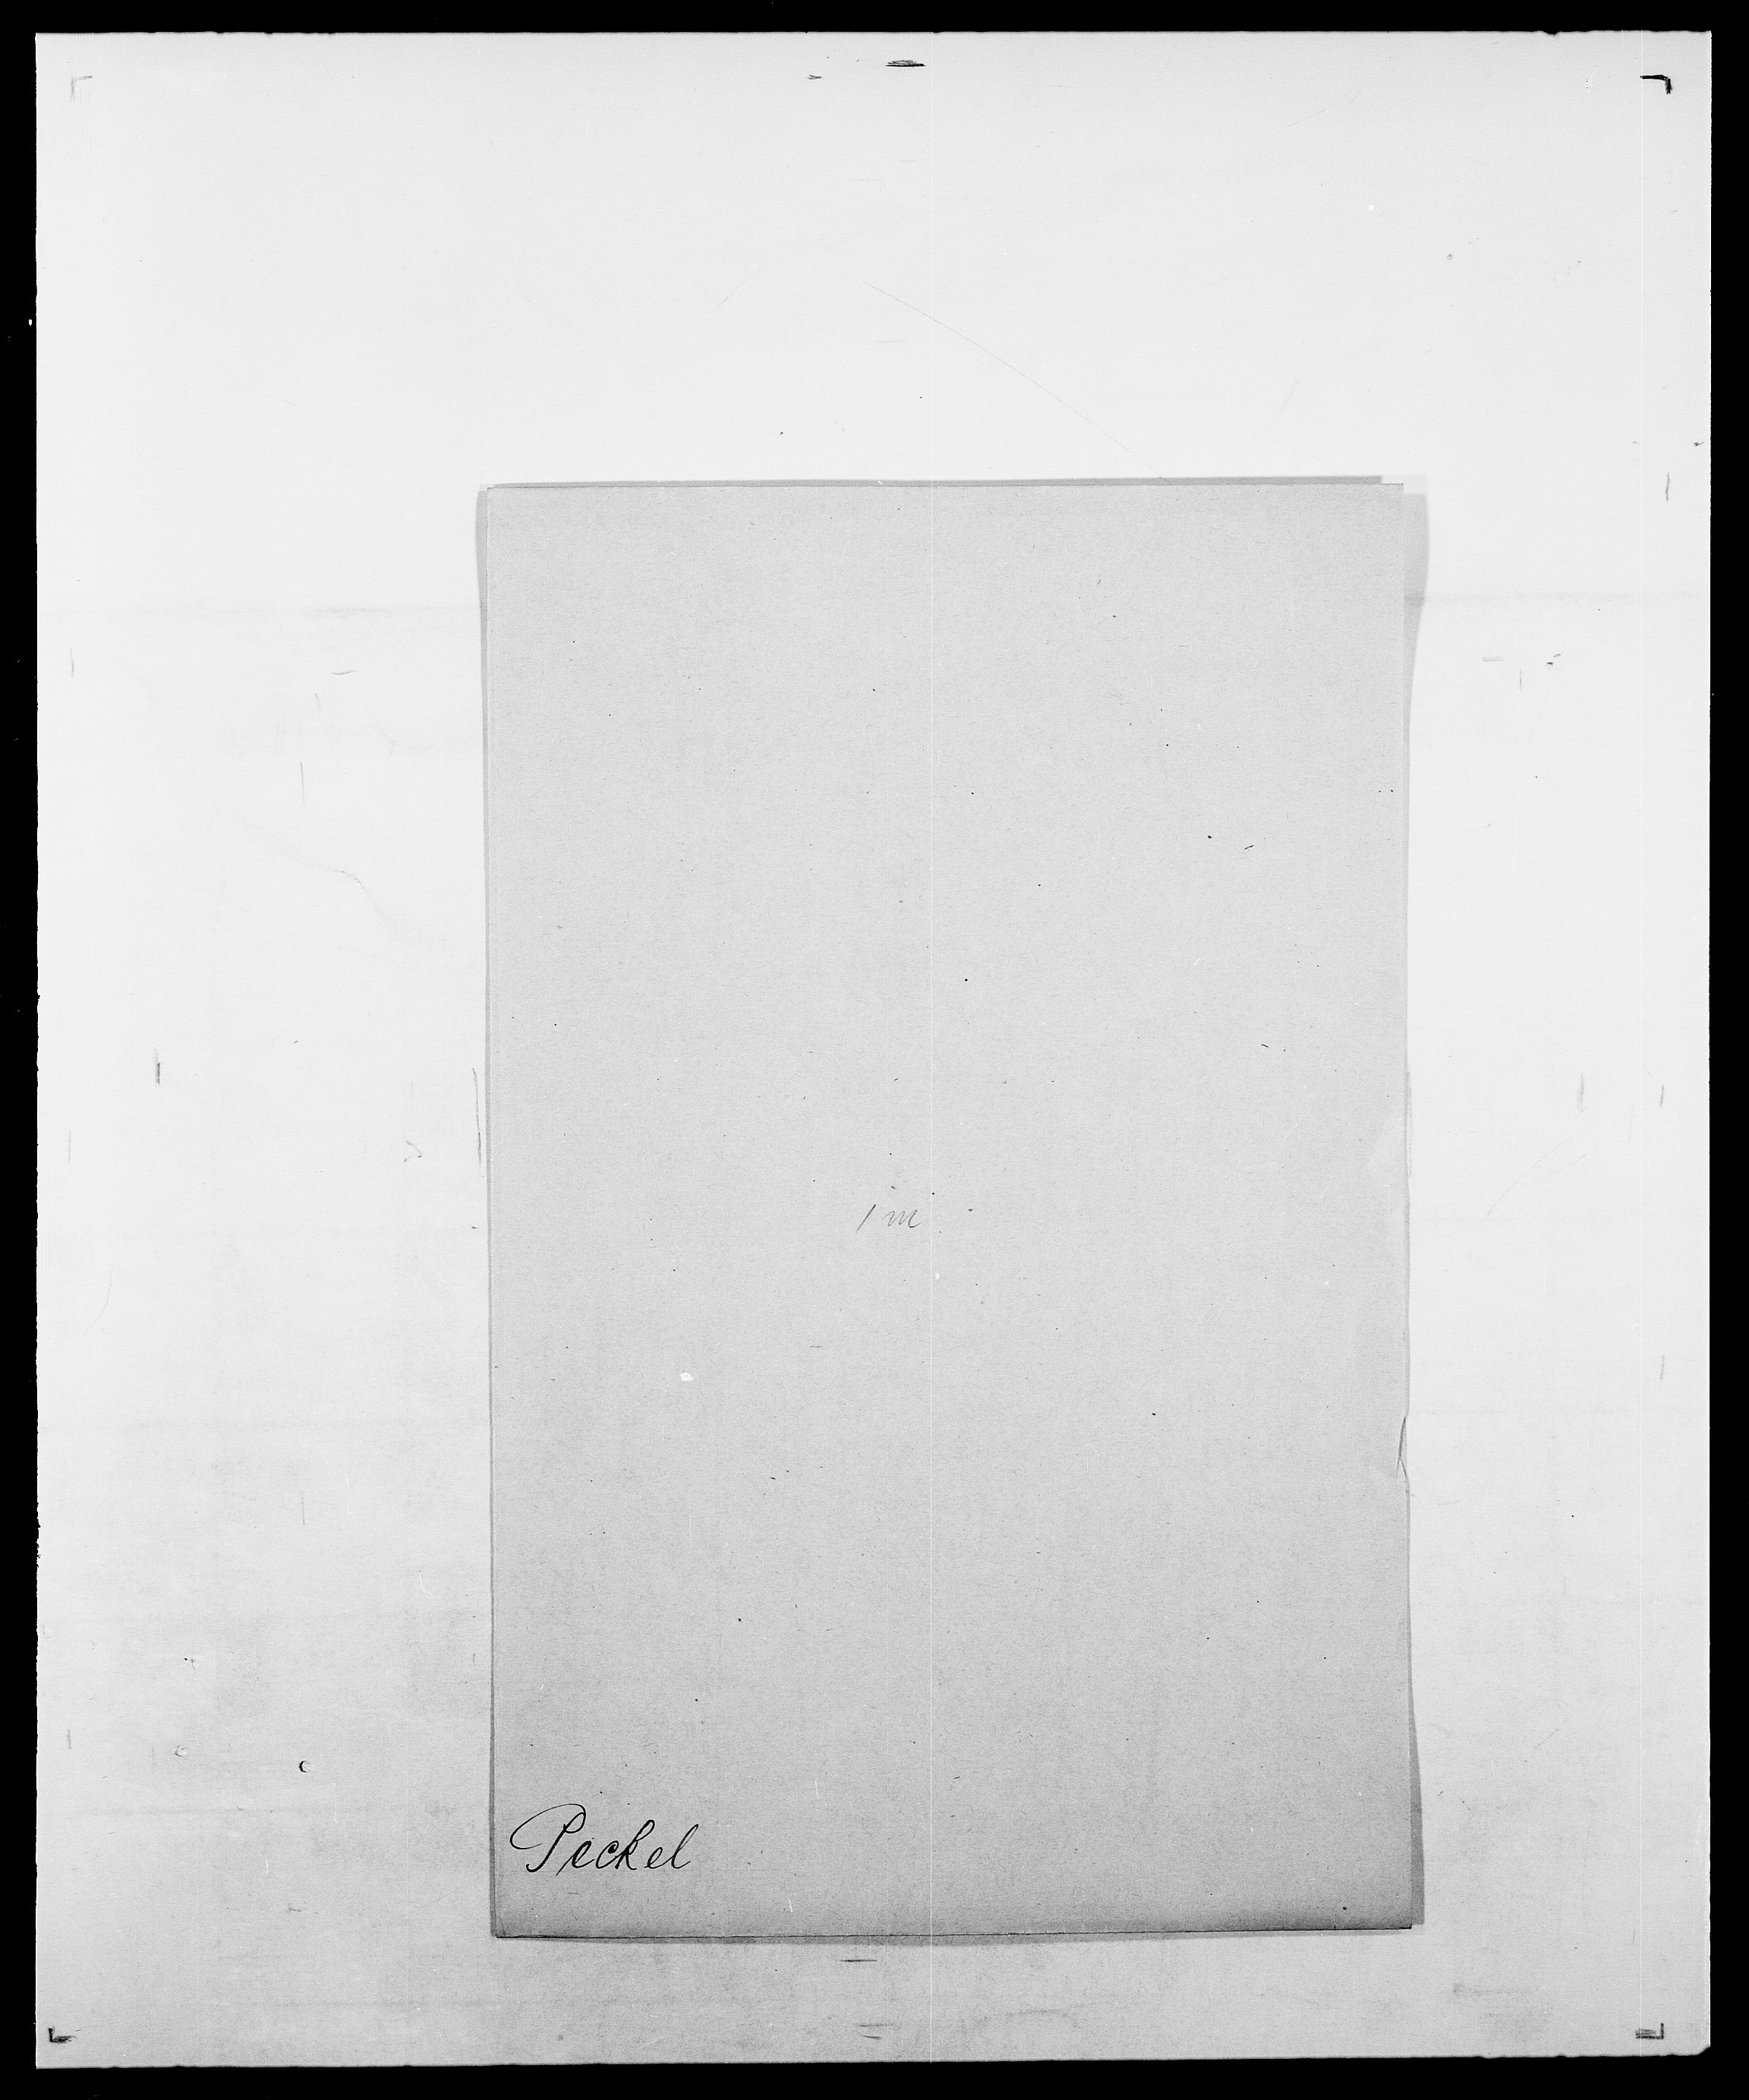 SAO, Delgobe, Charles Antoine - samling, D/Da/L0030: Paars - Pittelkov, s. 268